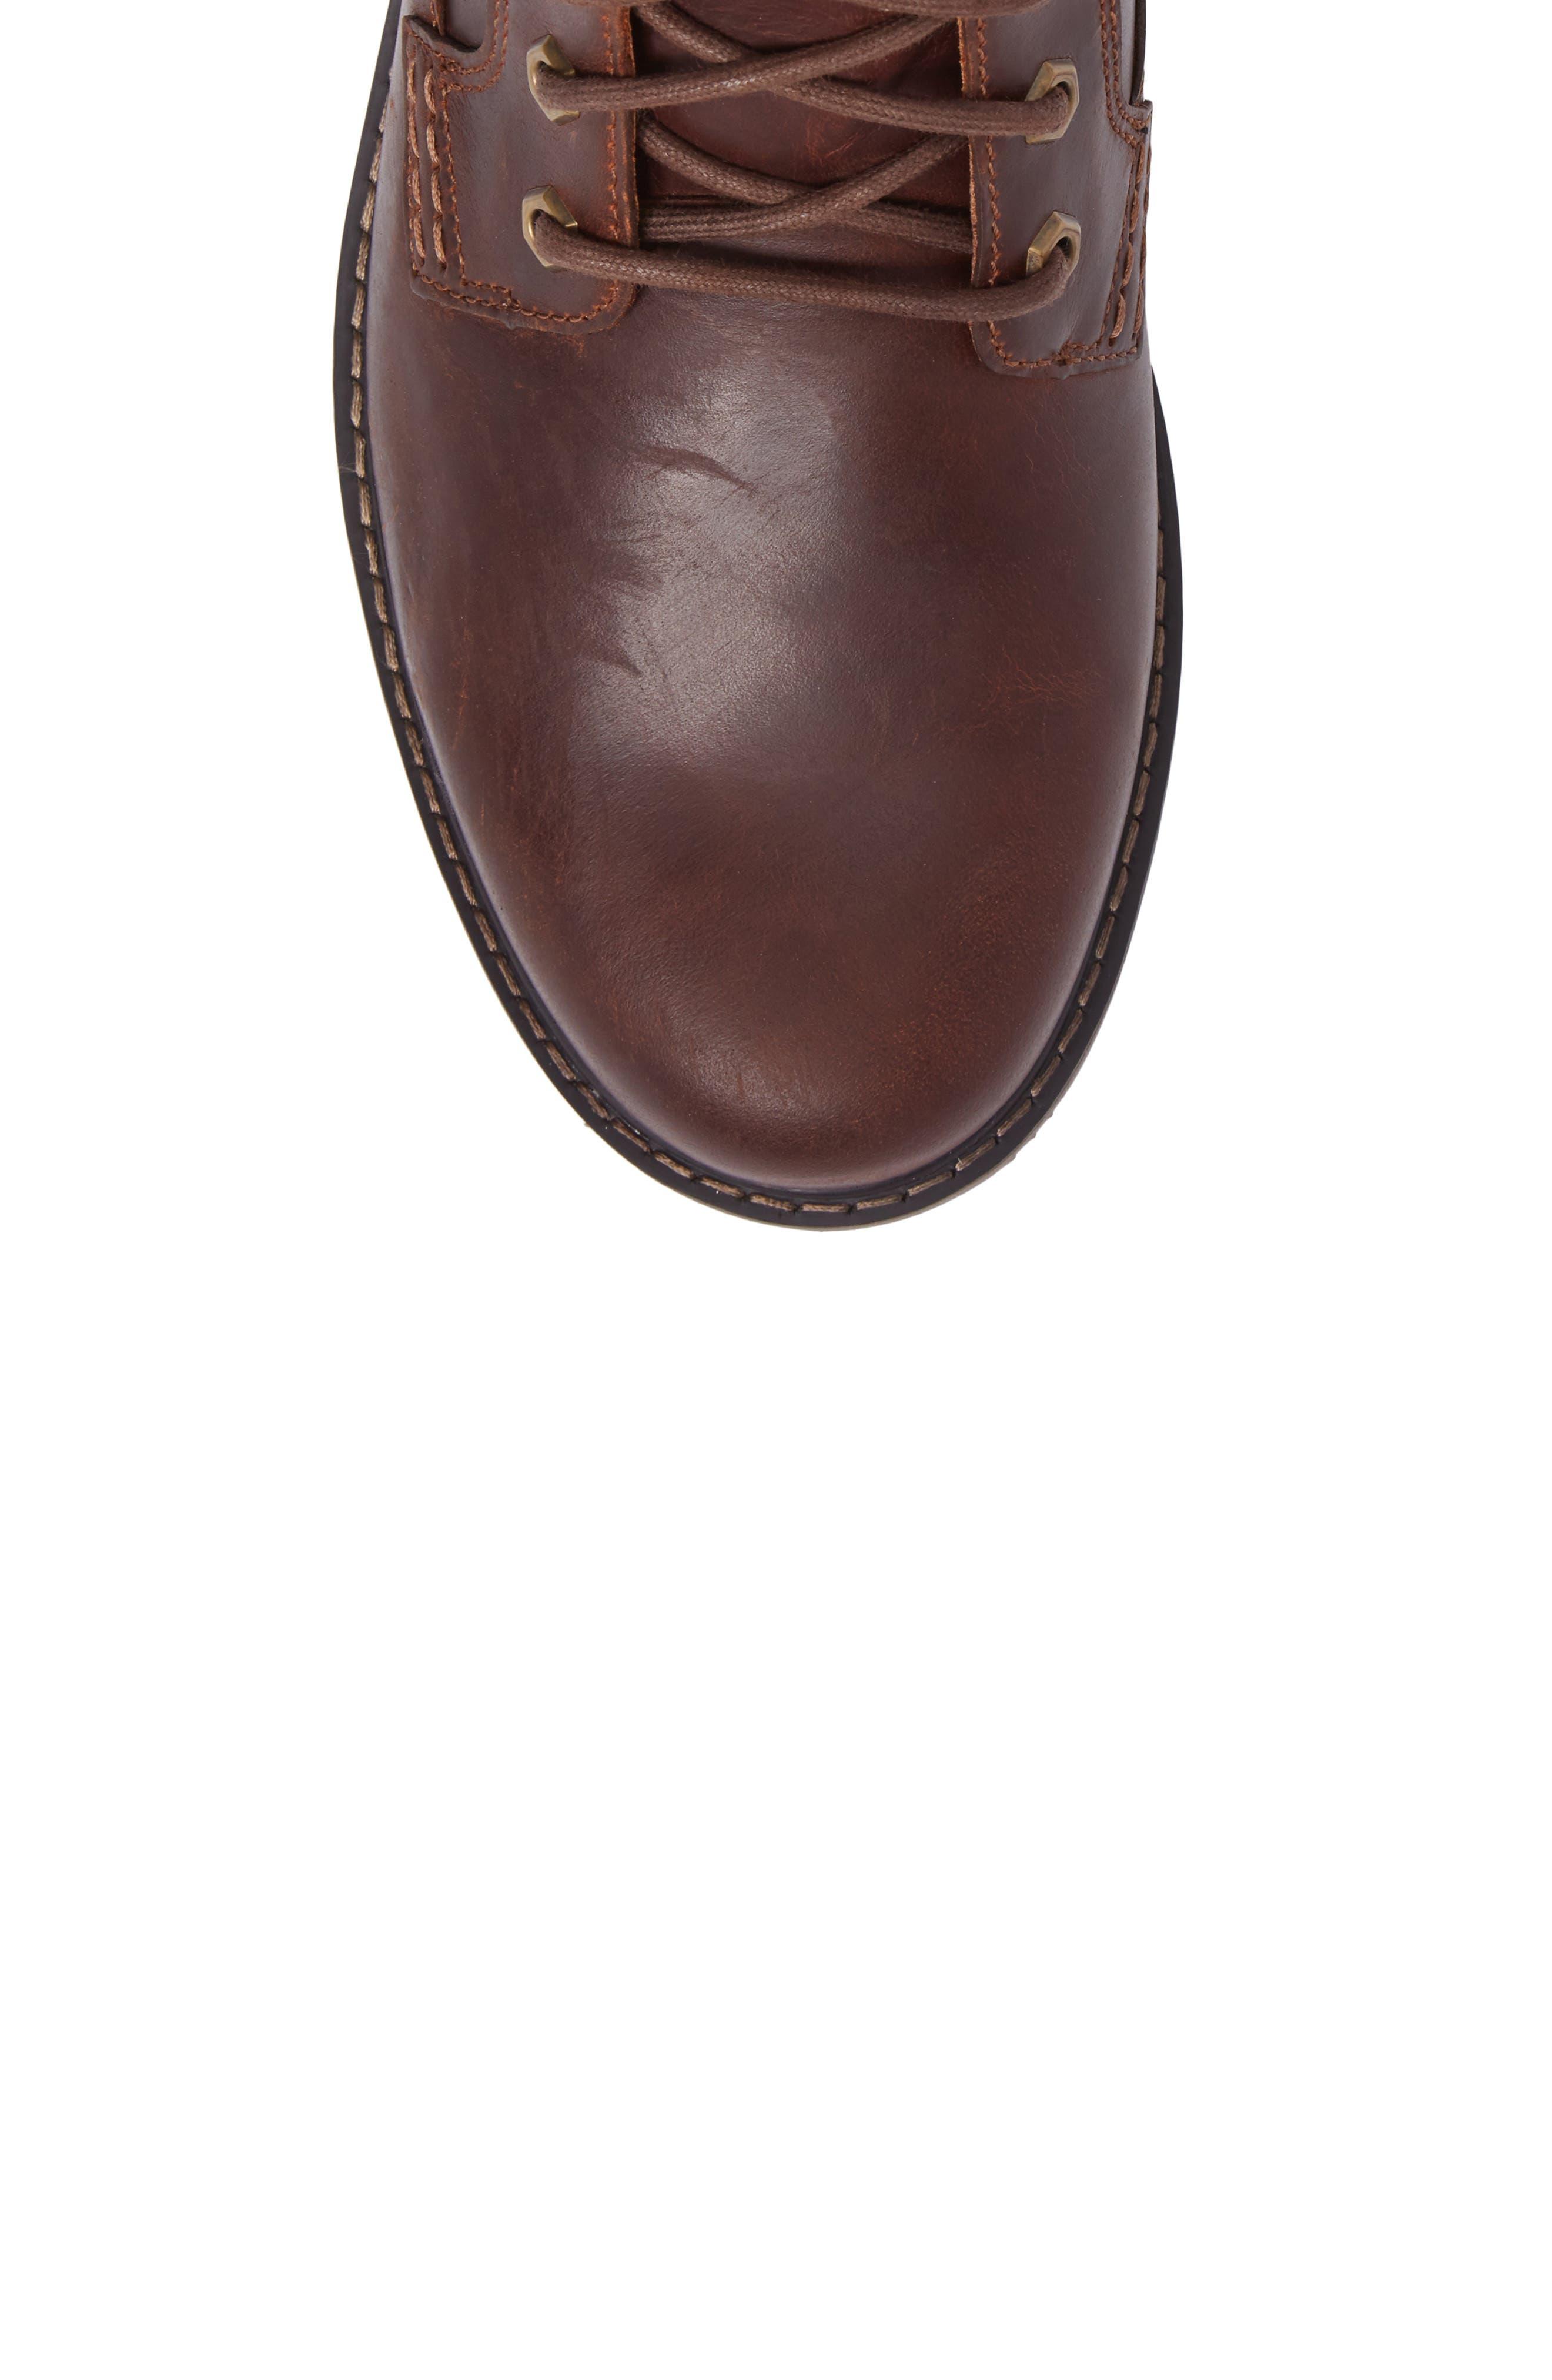 DUNHAM, Royalton Plain Toe Boot, Alternate thumbnail 5, color, BROWN